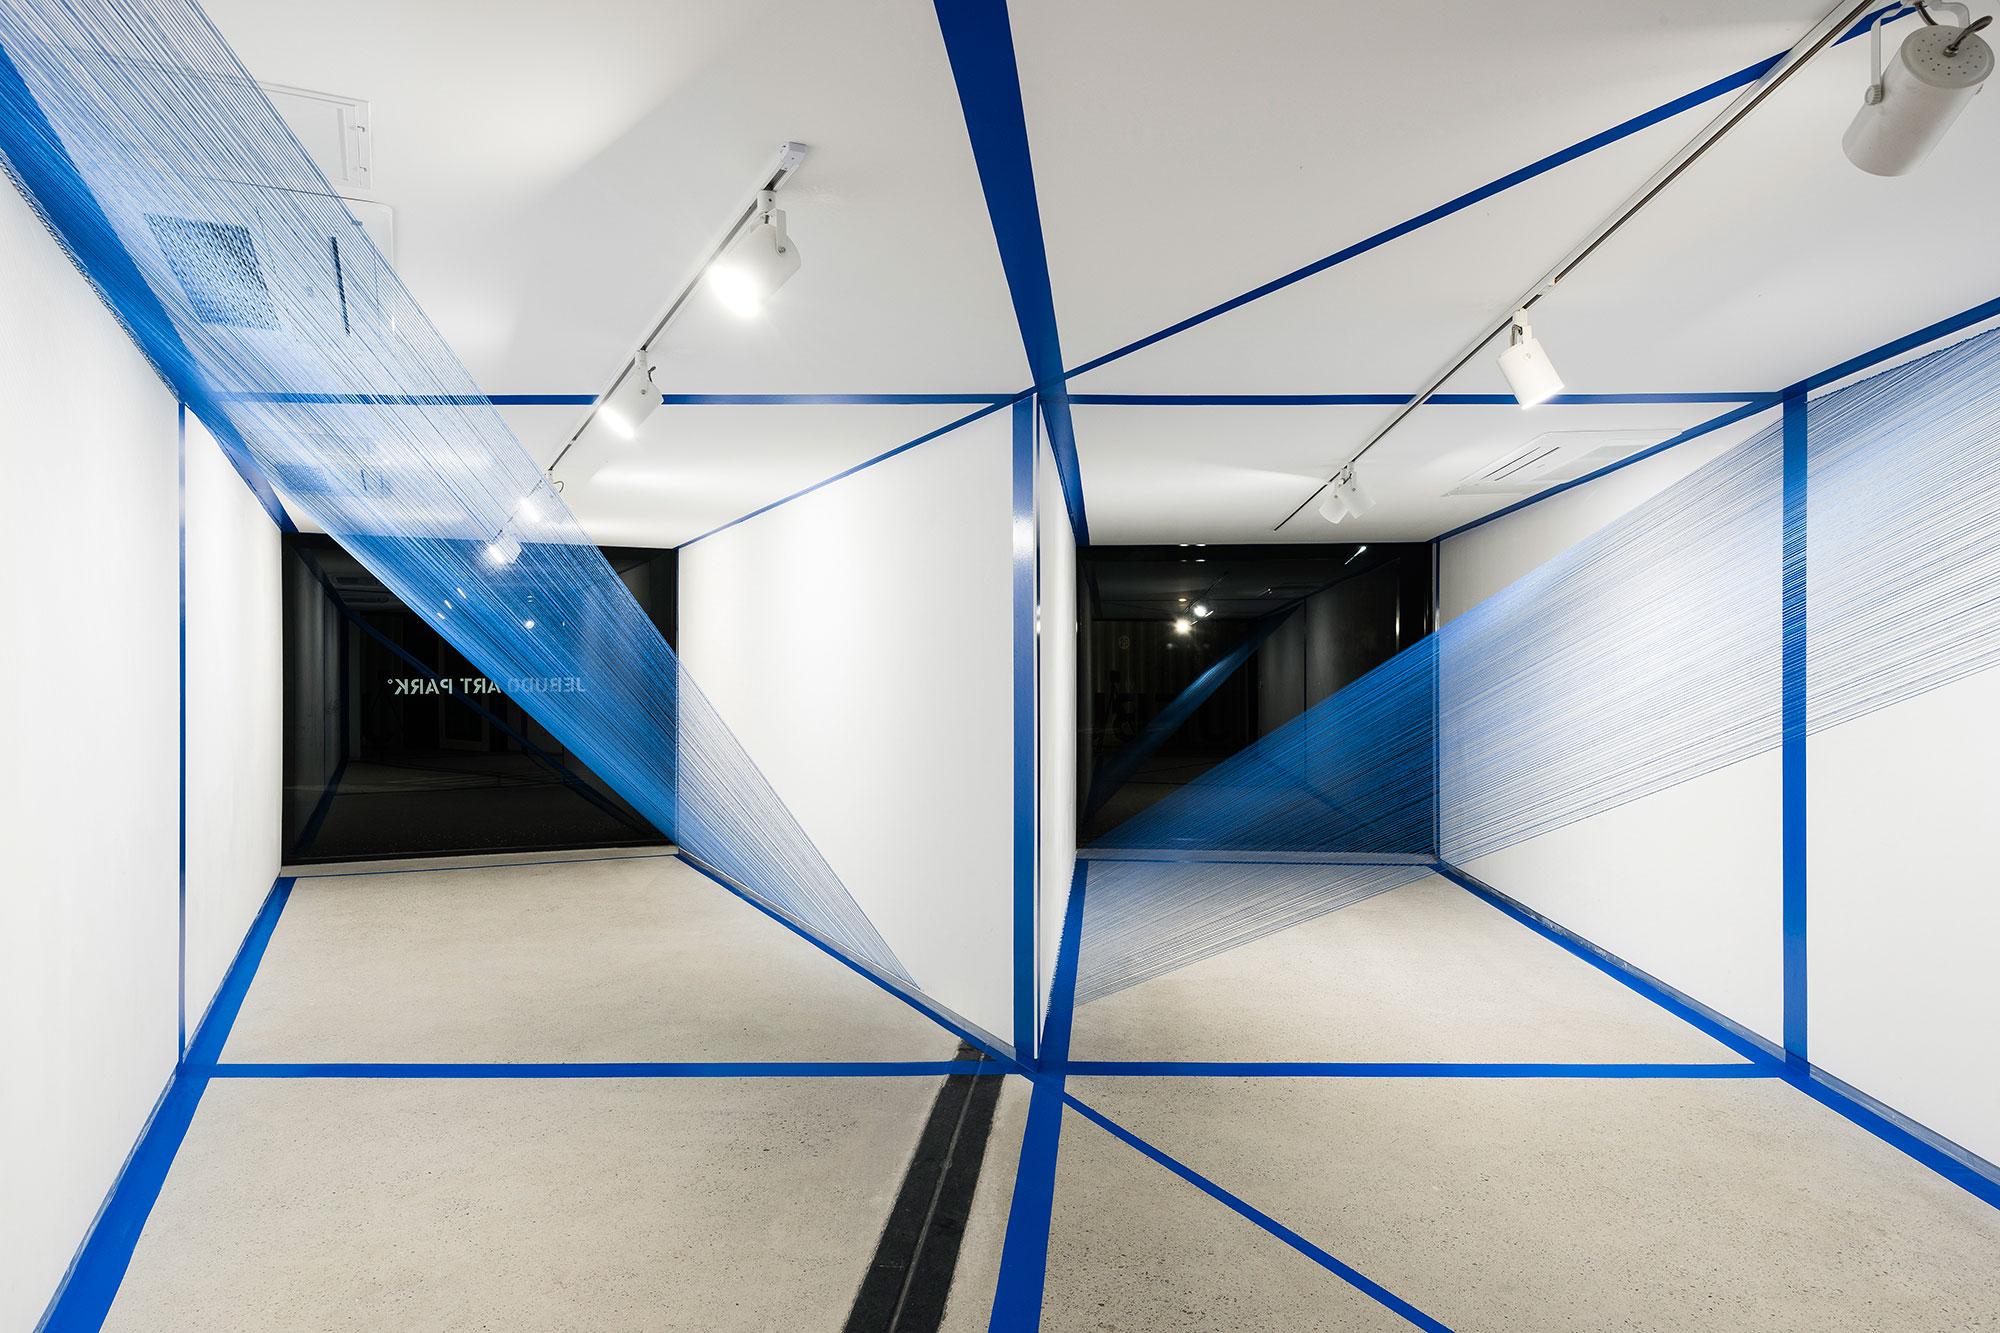 2.EunHyeKang_Gestalt_Tape,-Cotton-yarn_Site-specific-installation_2018.jpg